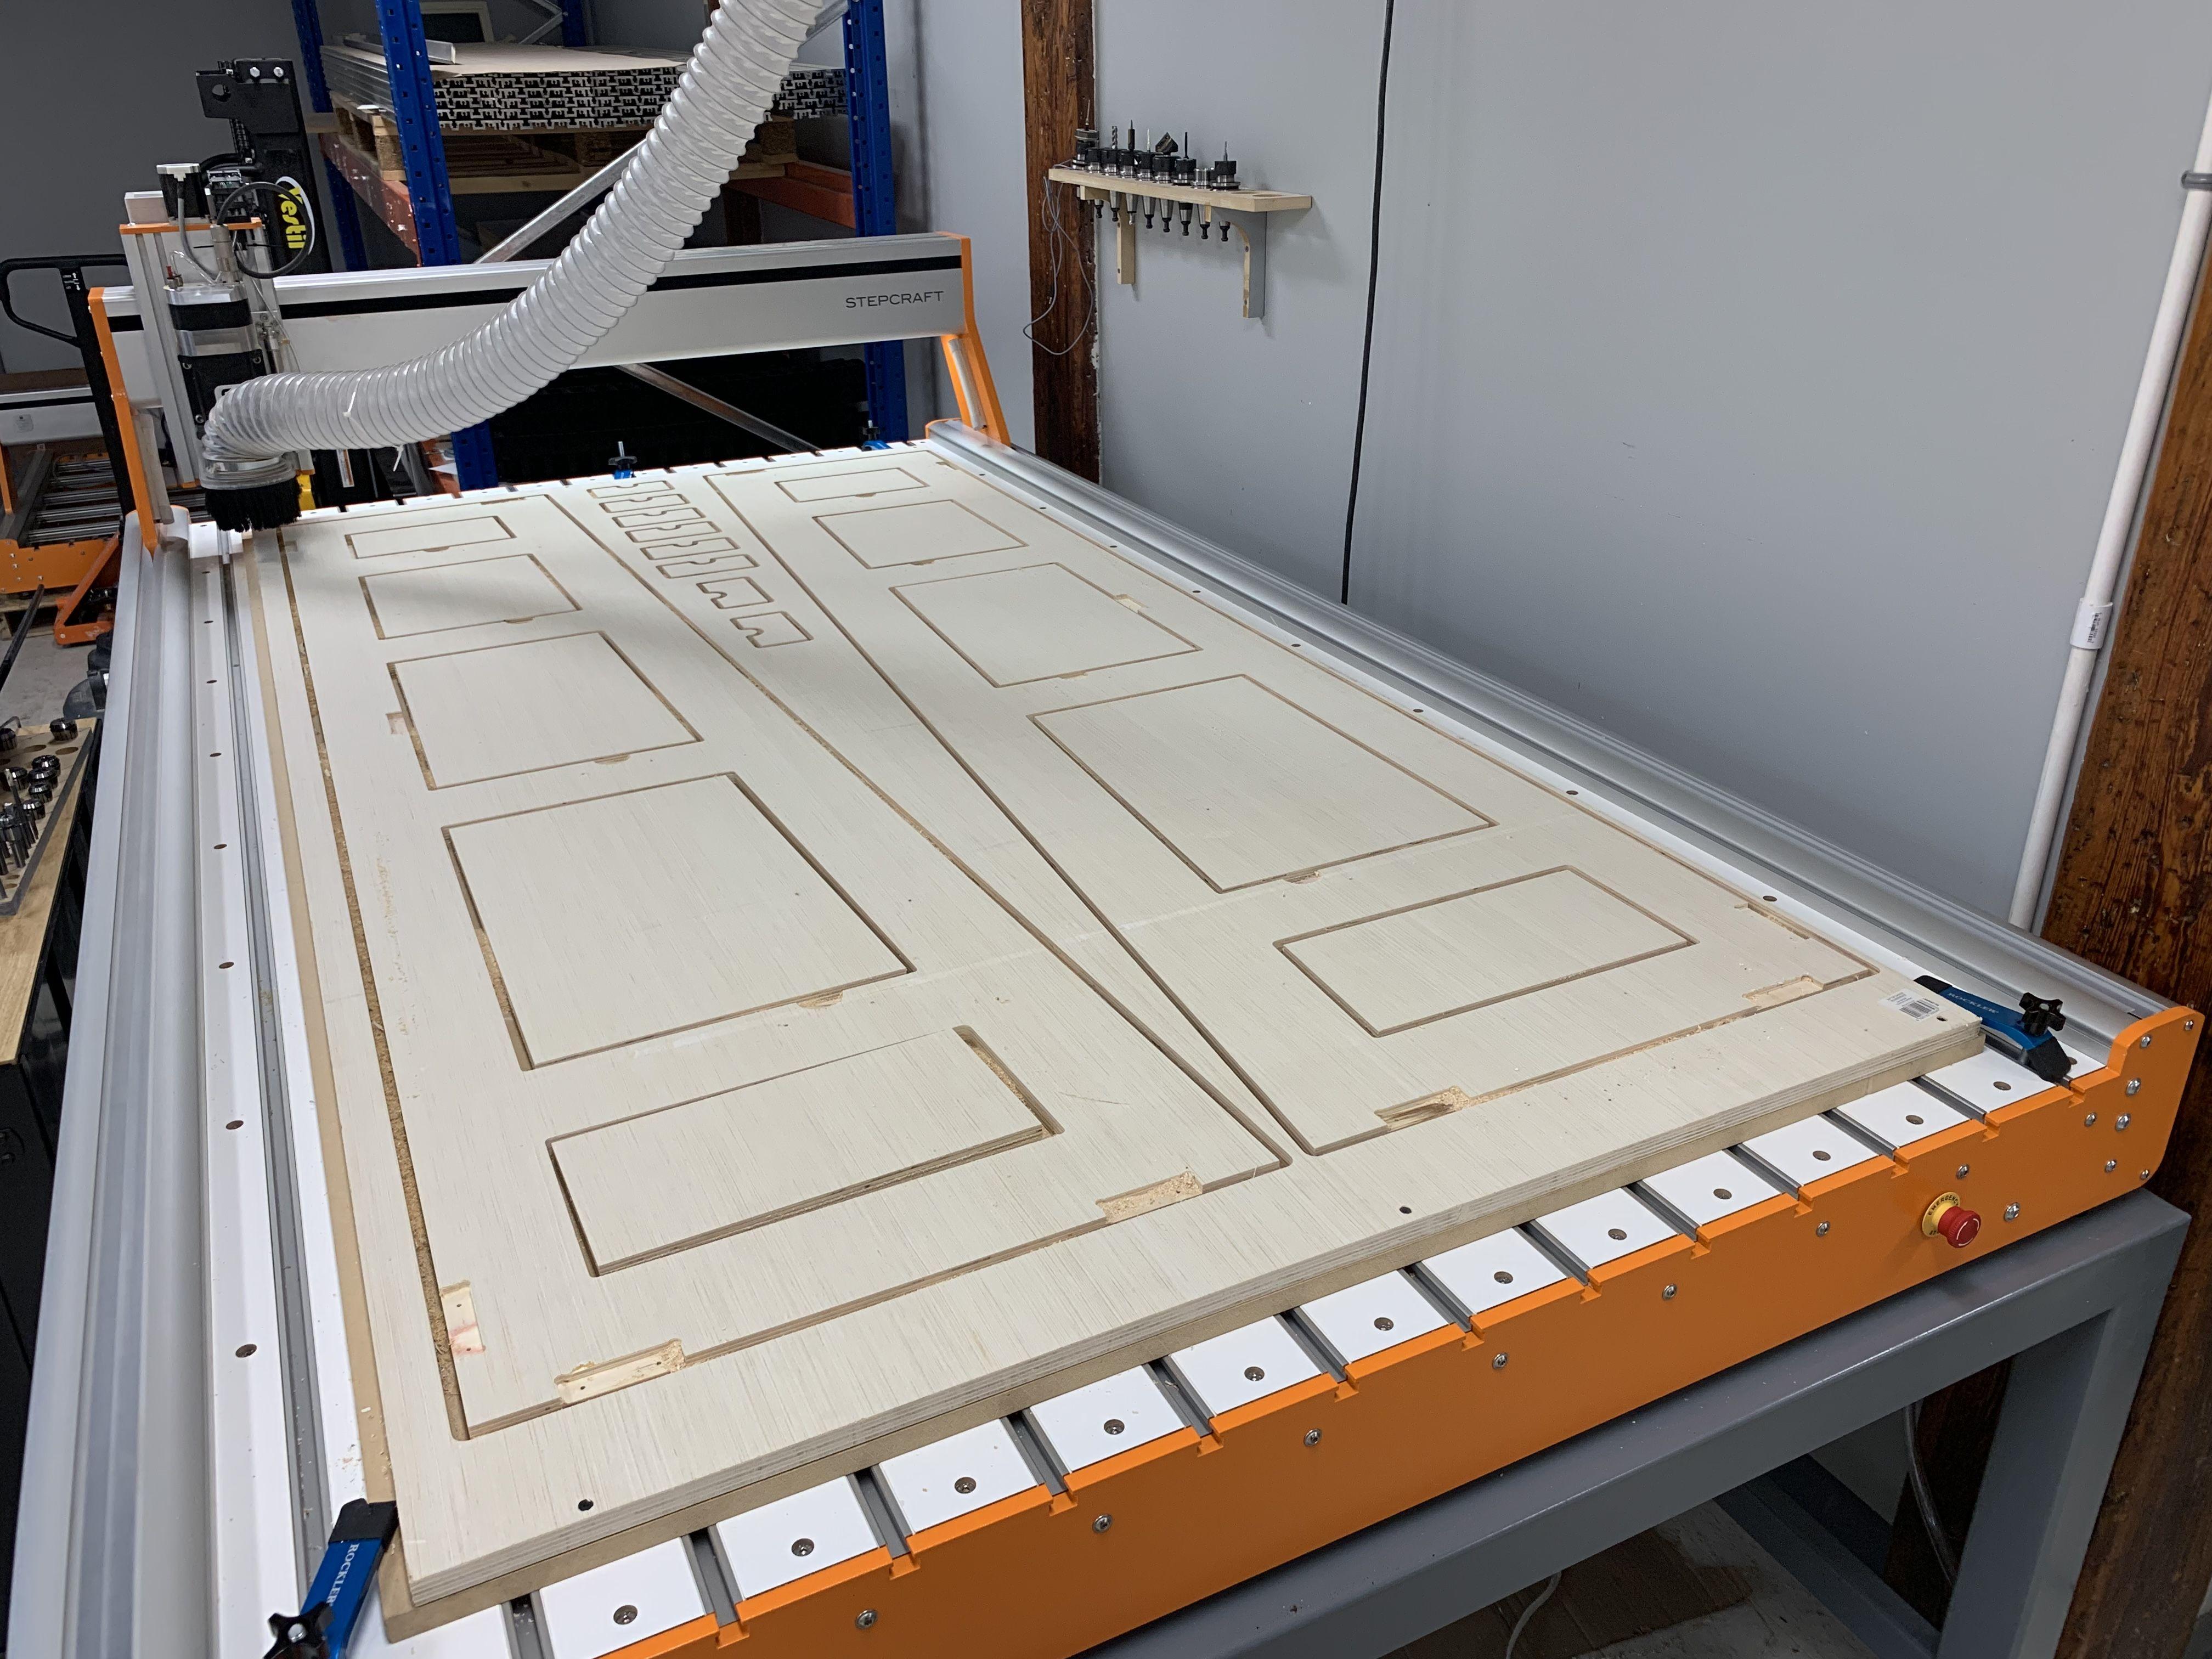 Pin On About Stepcraft Https Www Stepcraft Us Torrington Ct Usa Cnc Diy Woodworking 3dprinting